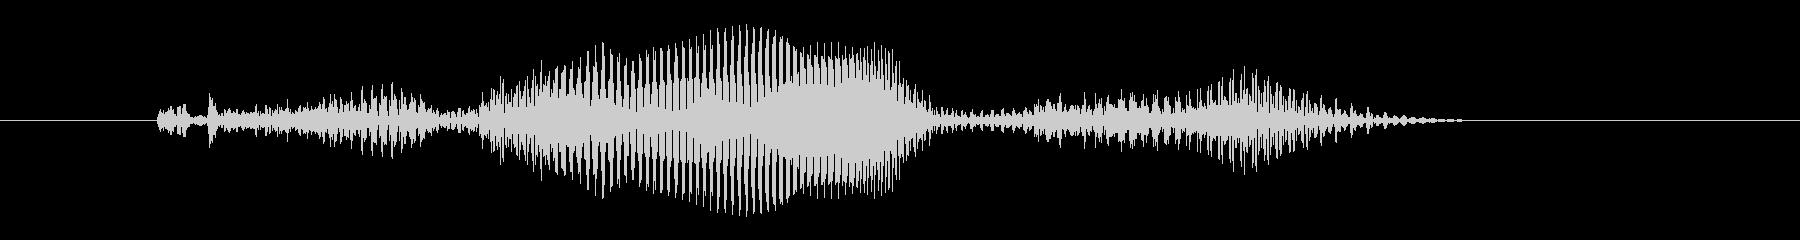 CLOSE・クローズ (男の子)の未再生の波形